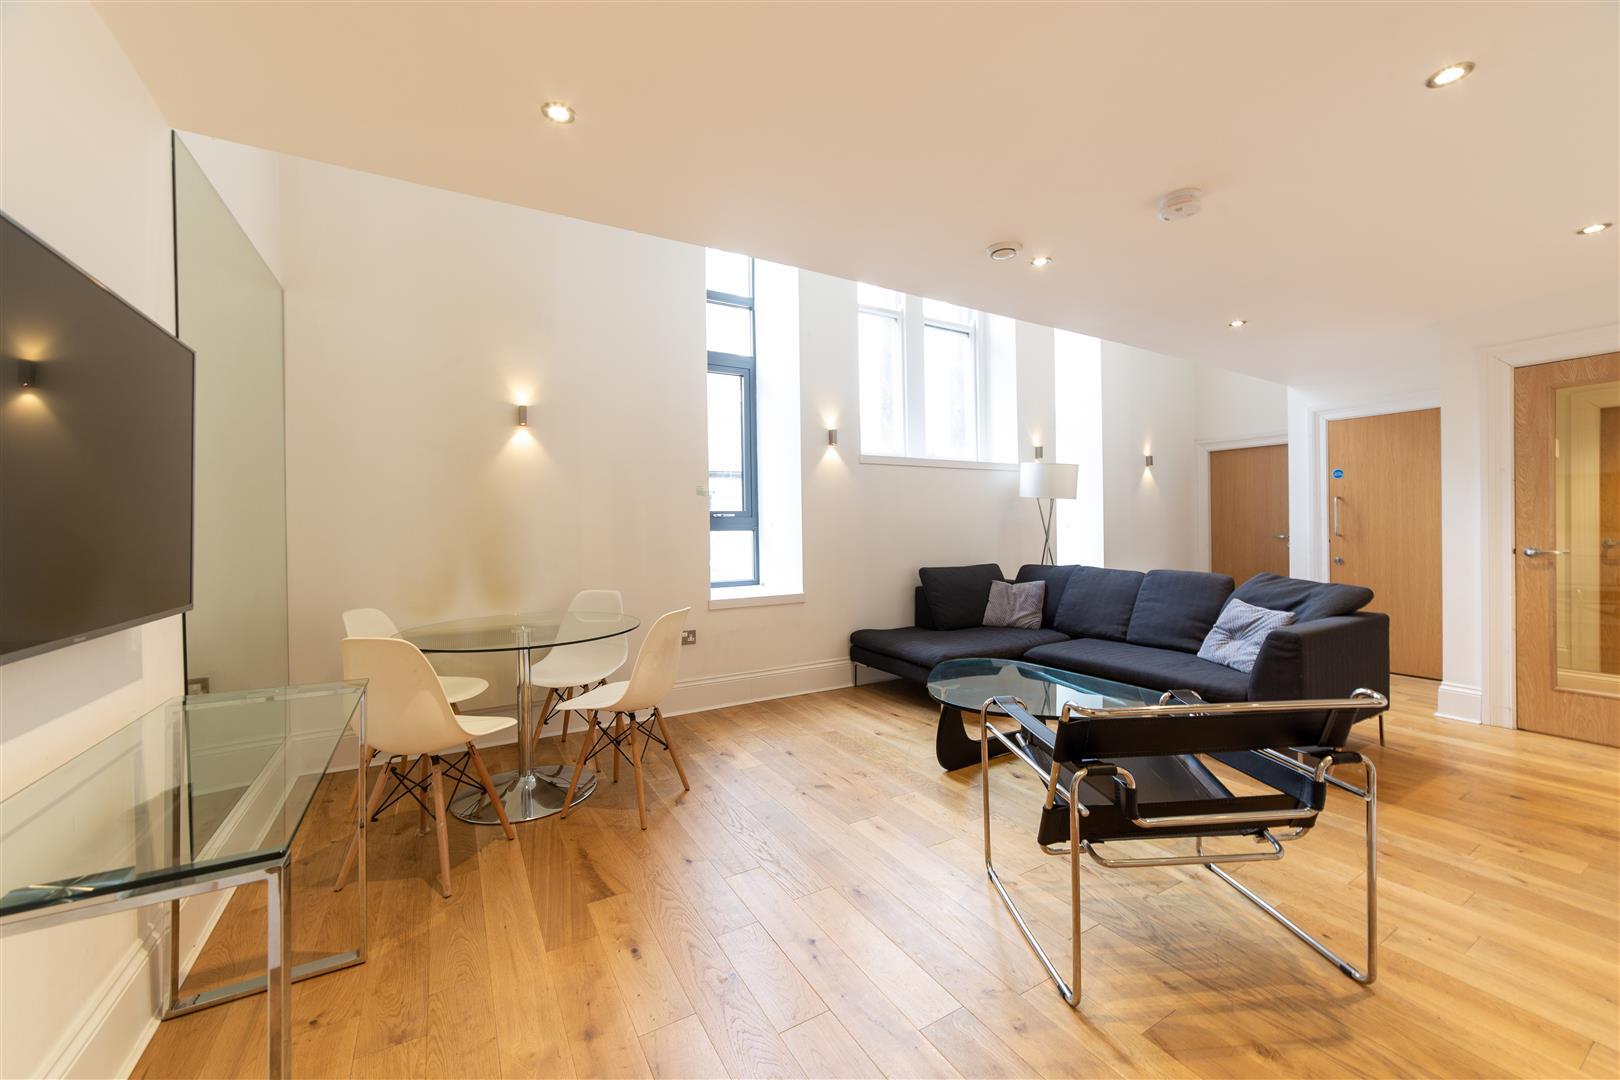 3 bed apartment to rent in City Centre, NE1 5JE, NE1